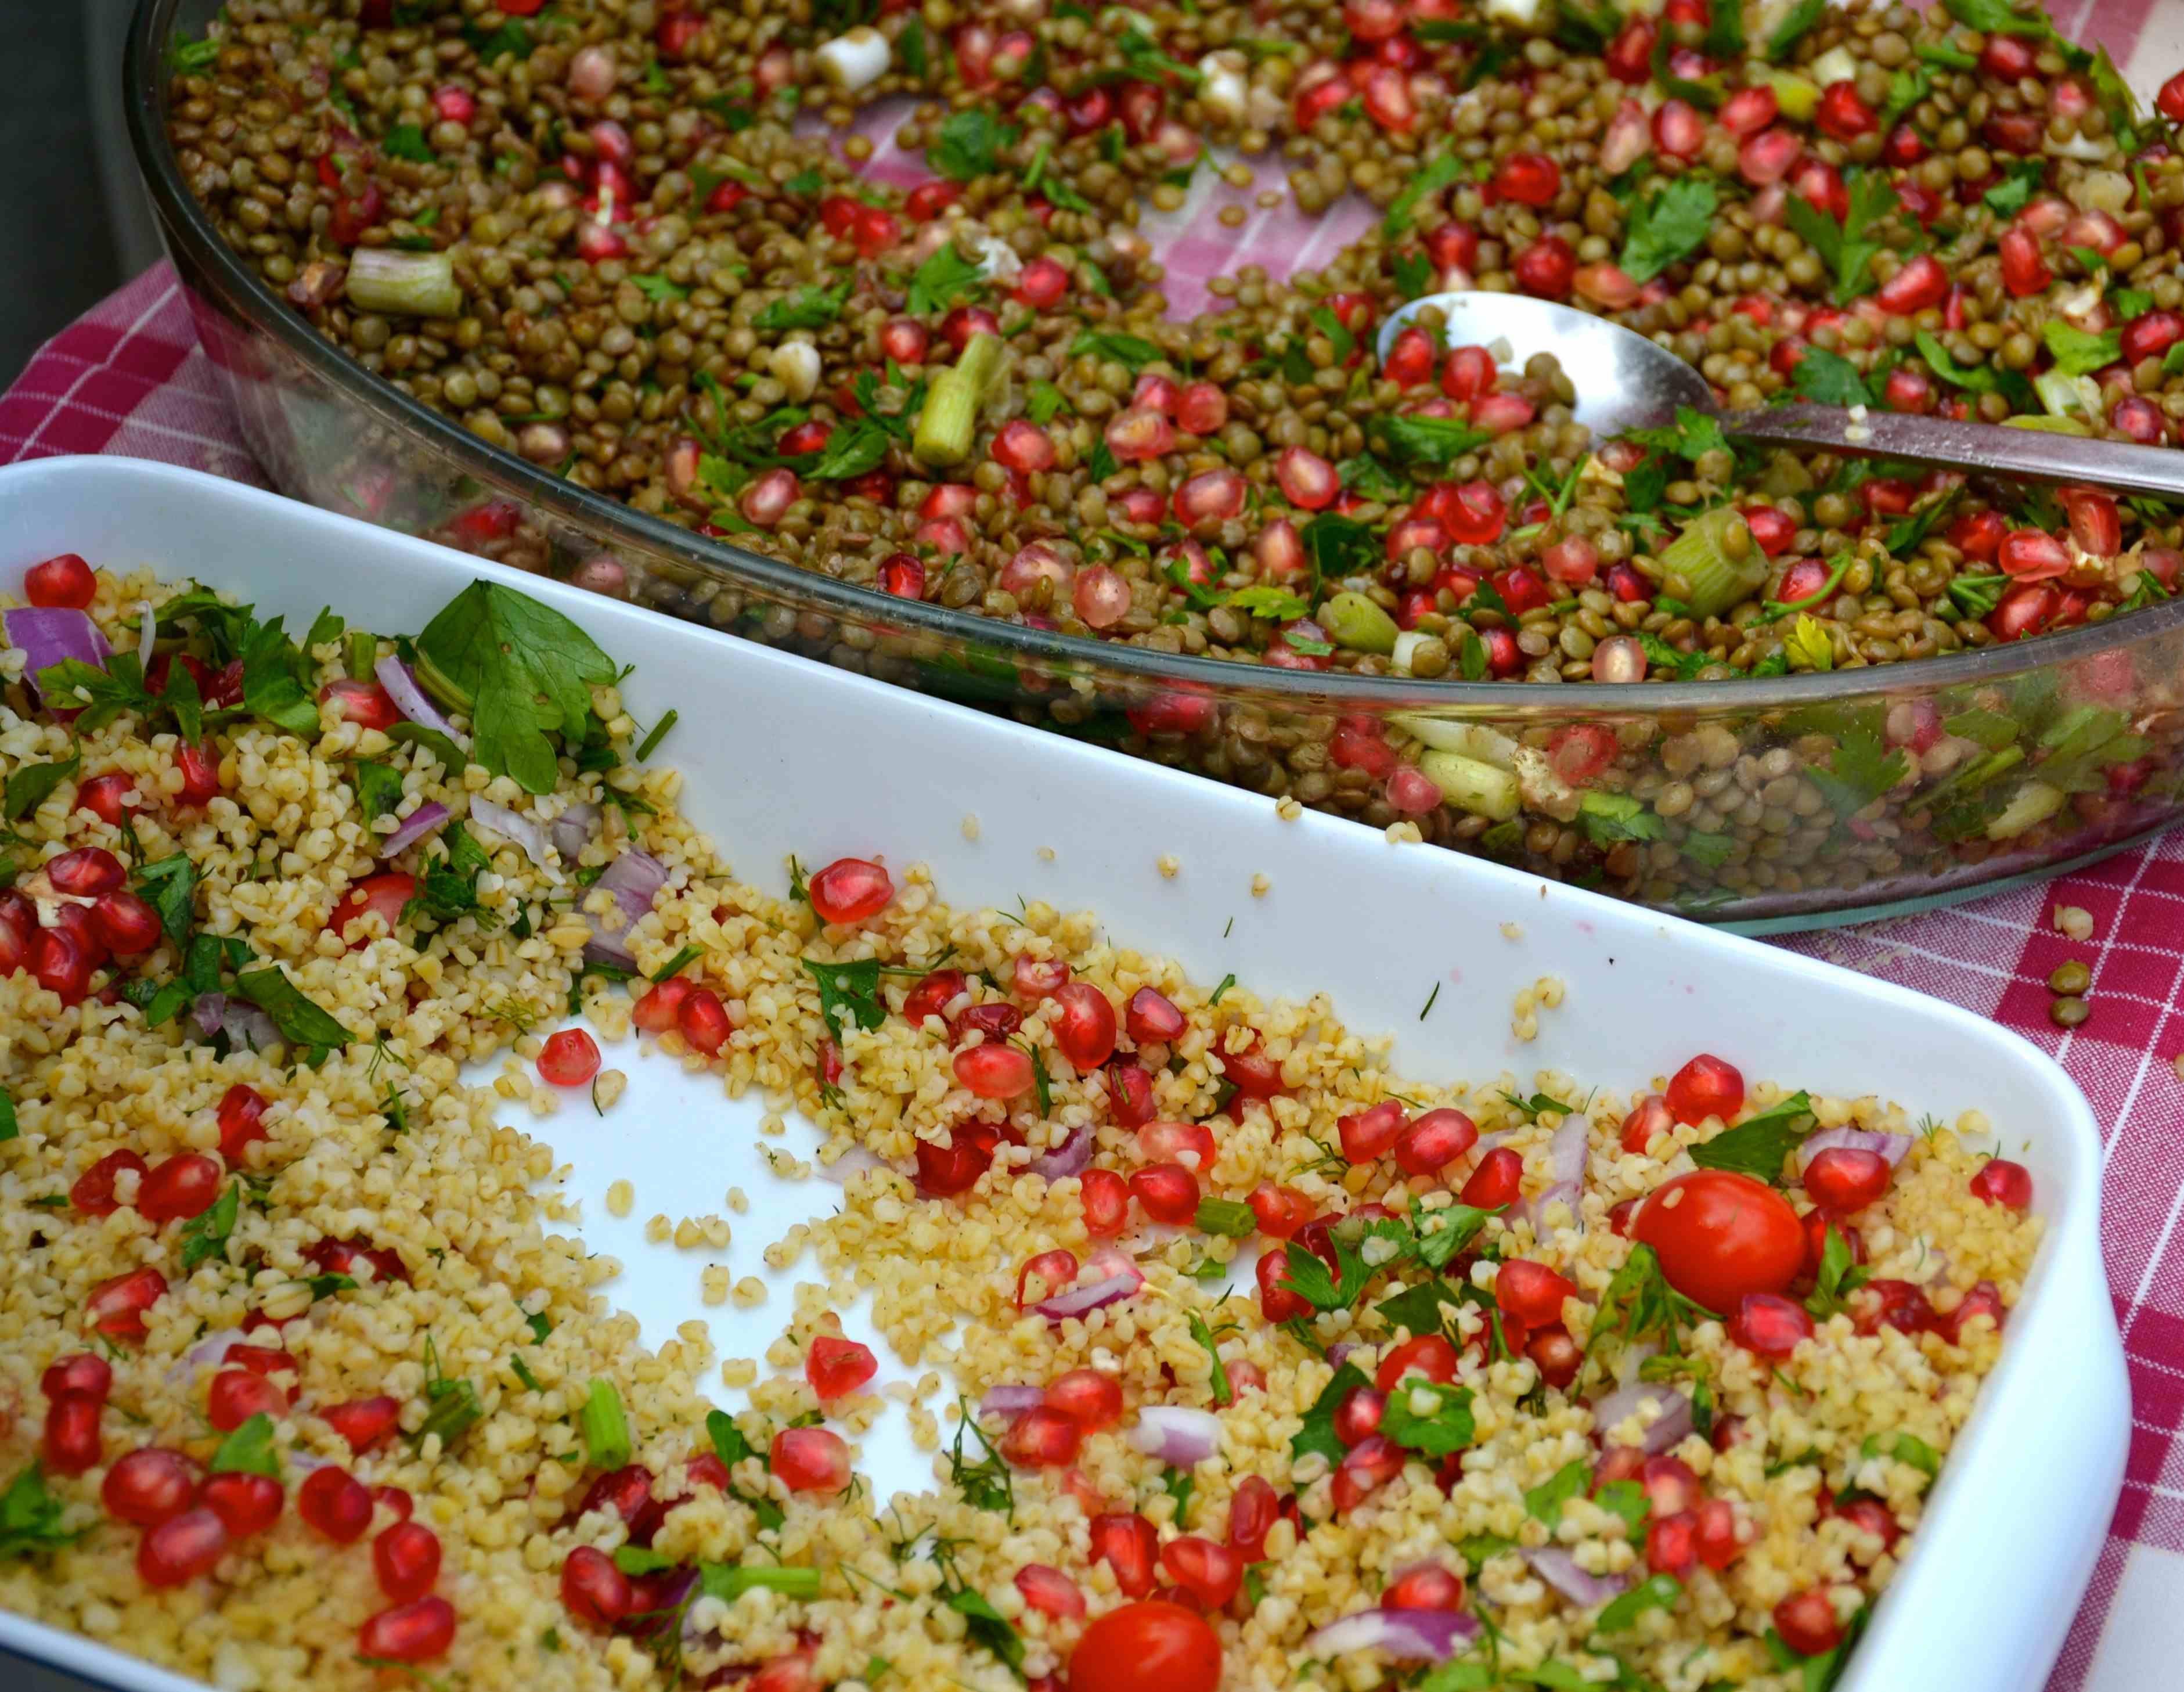 Salads with pomegranates